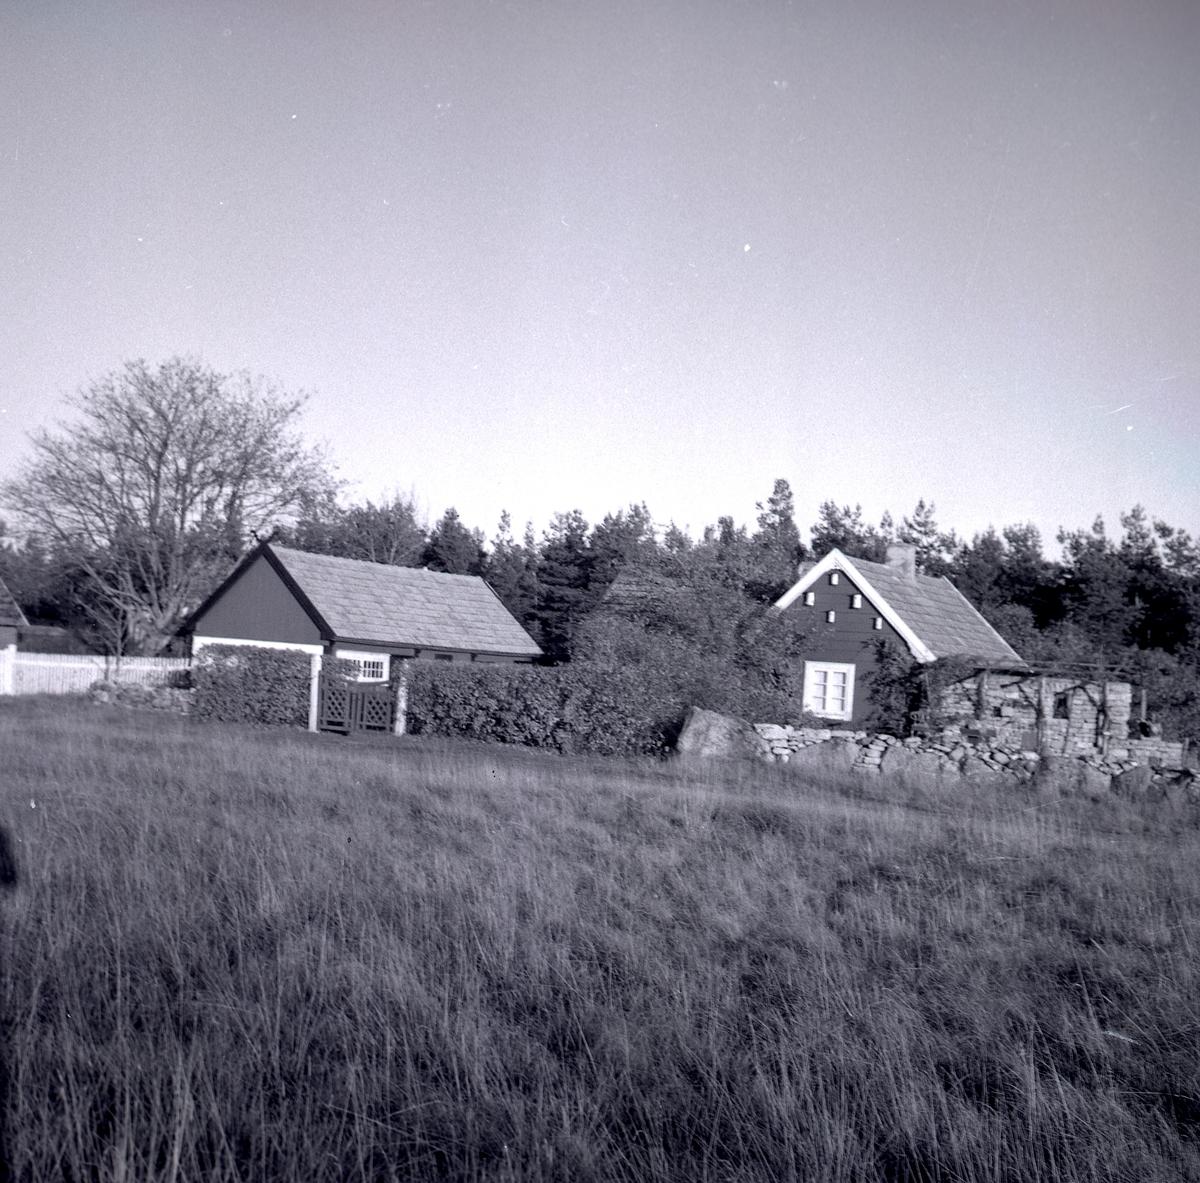 Ett bostadshus och en ekonomibyggnad.